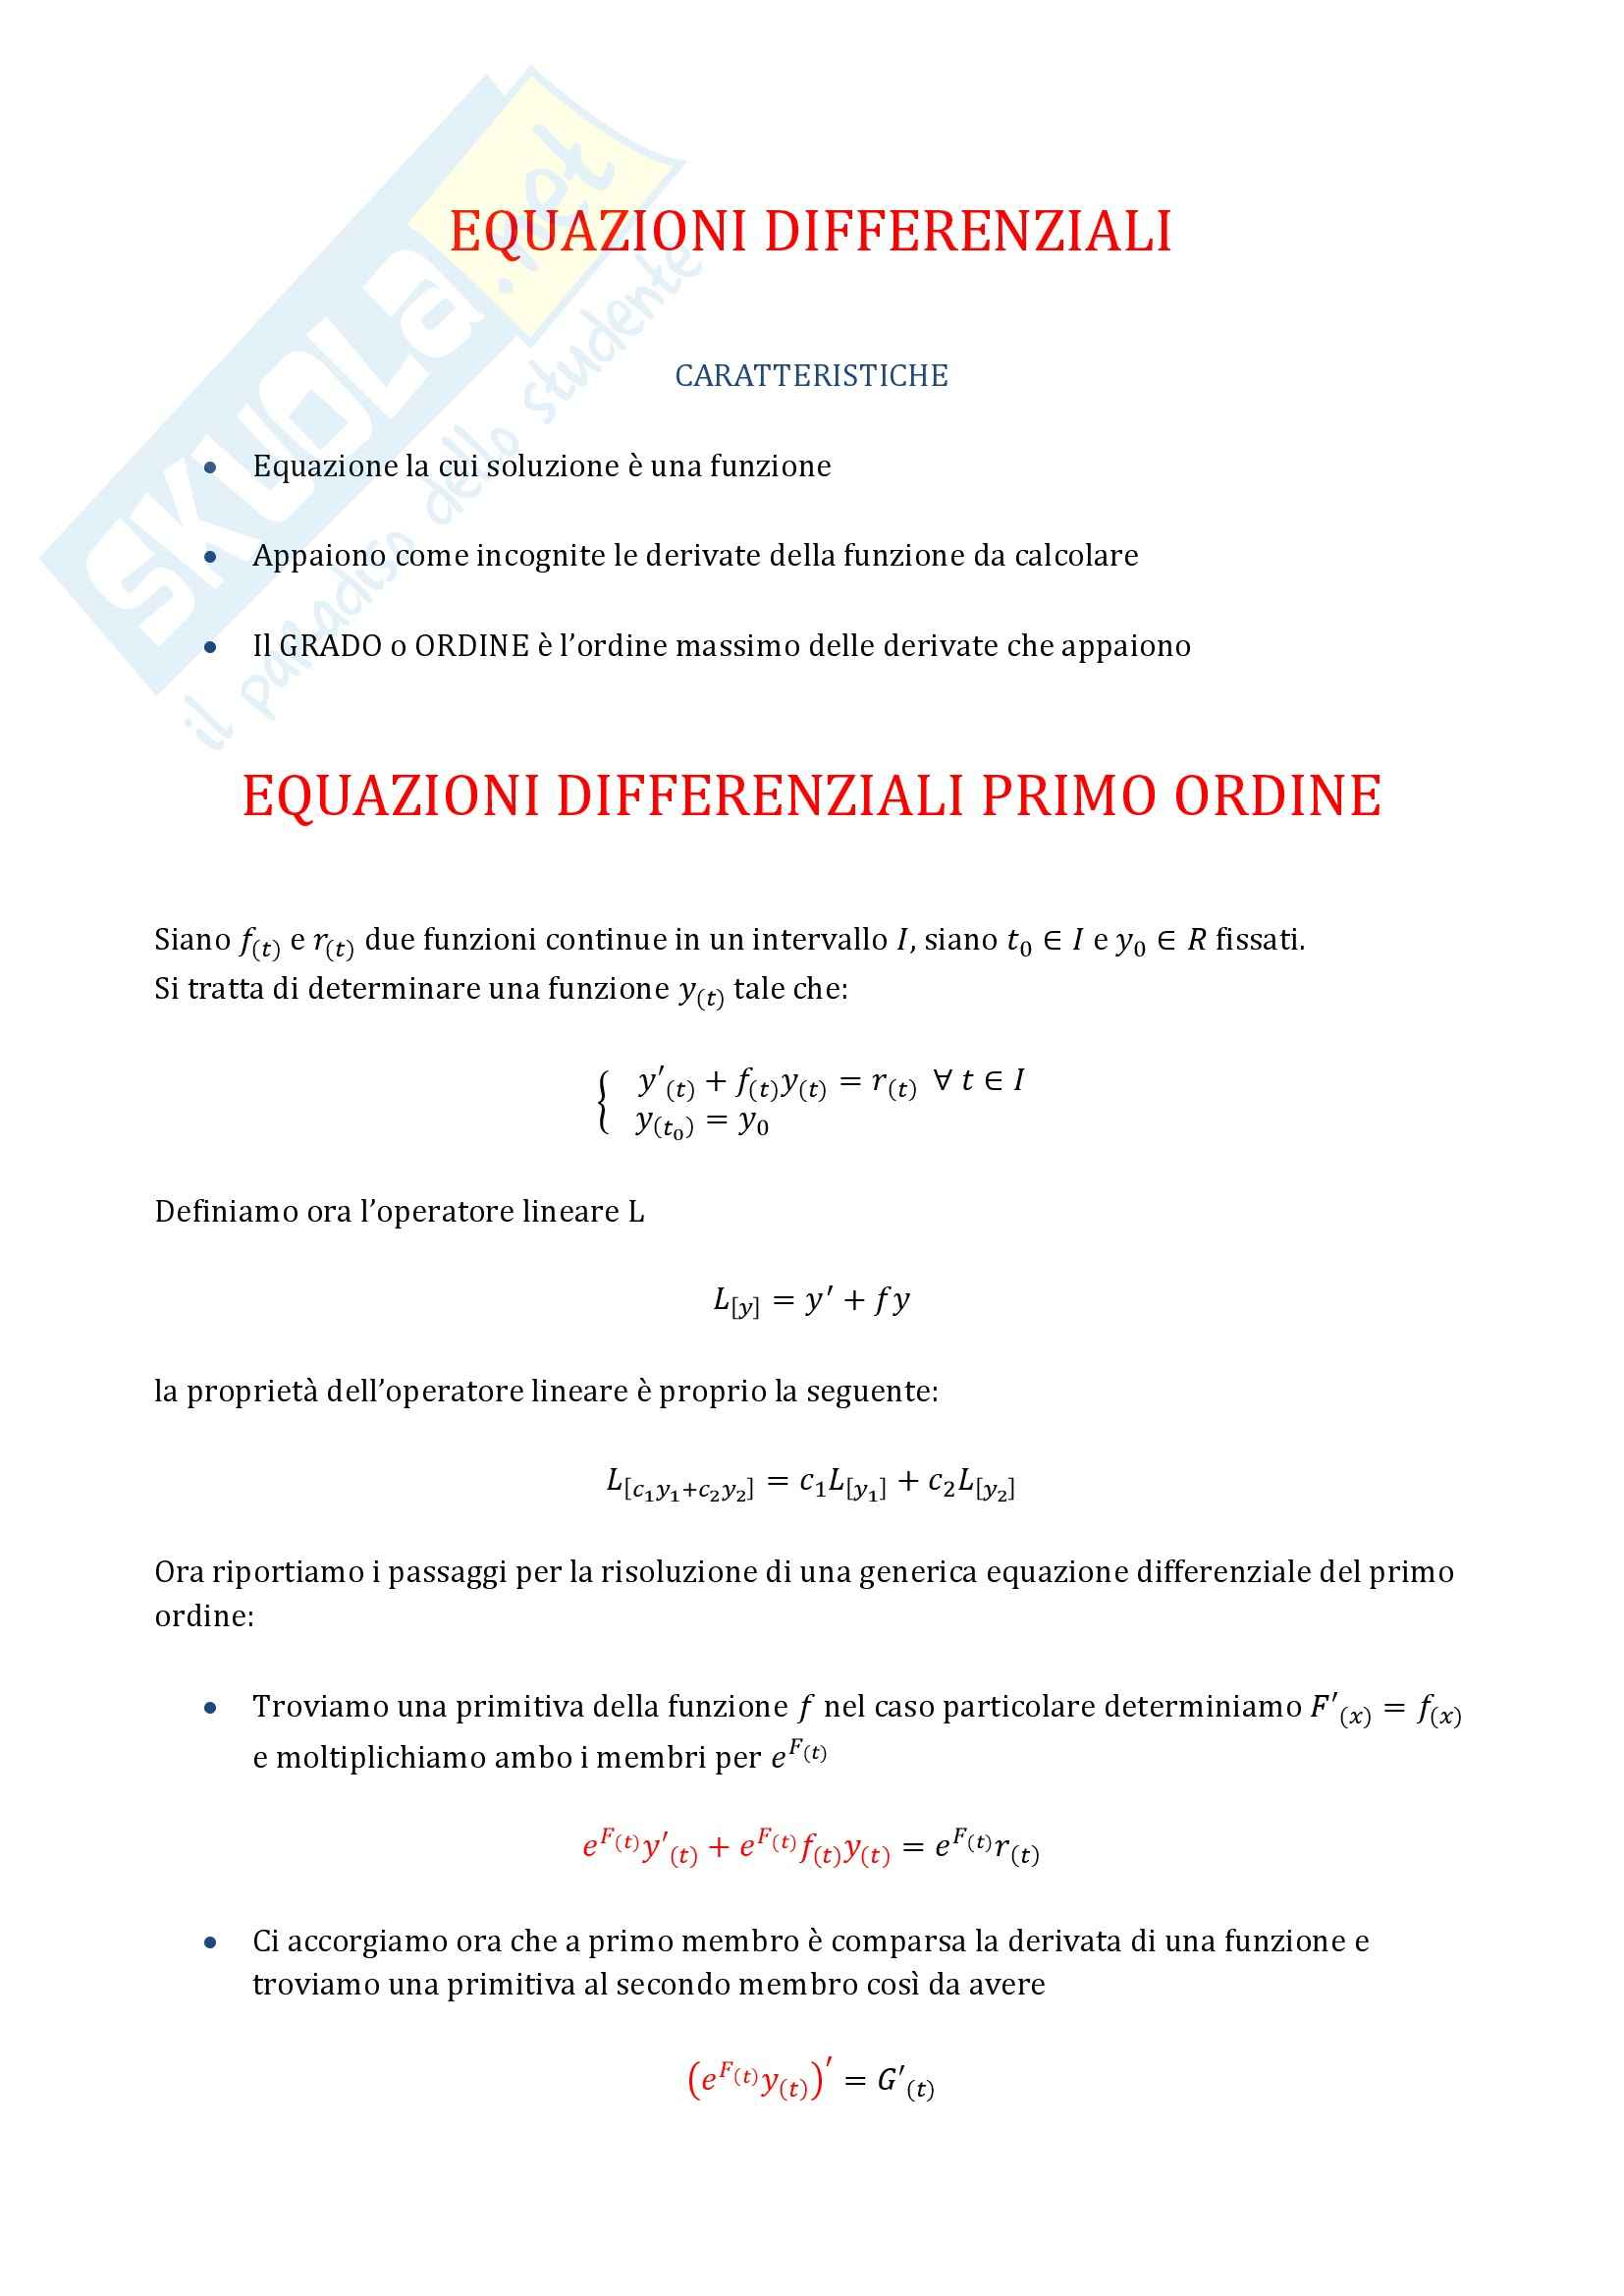 appunto L. Bergamaschi Analisi matematica 1